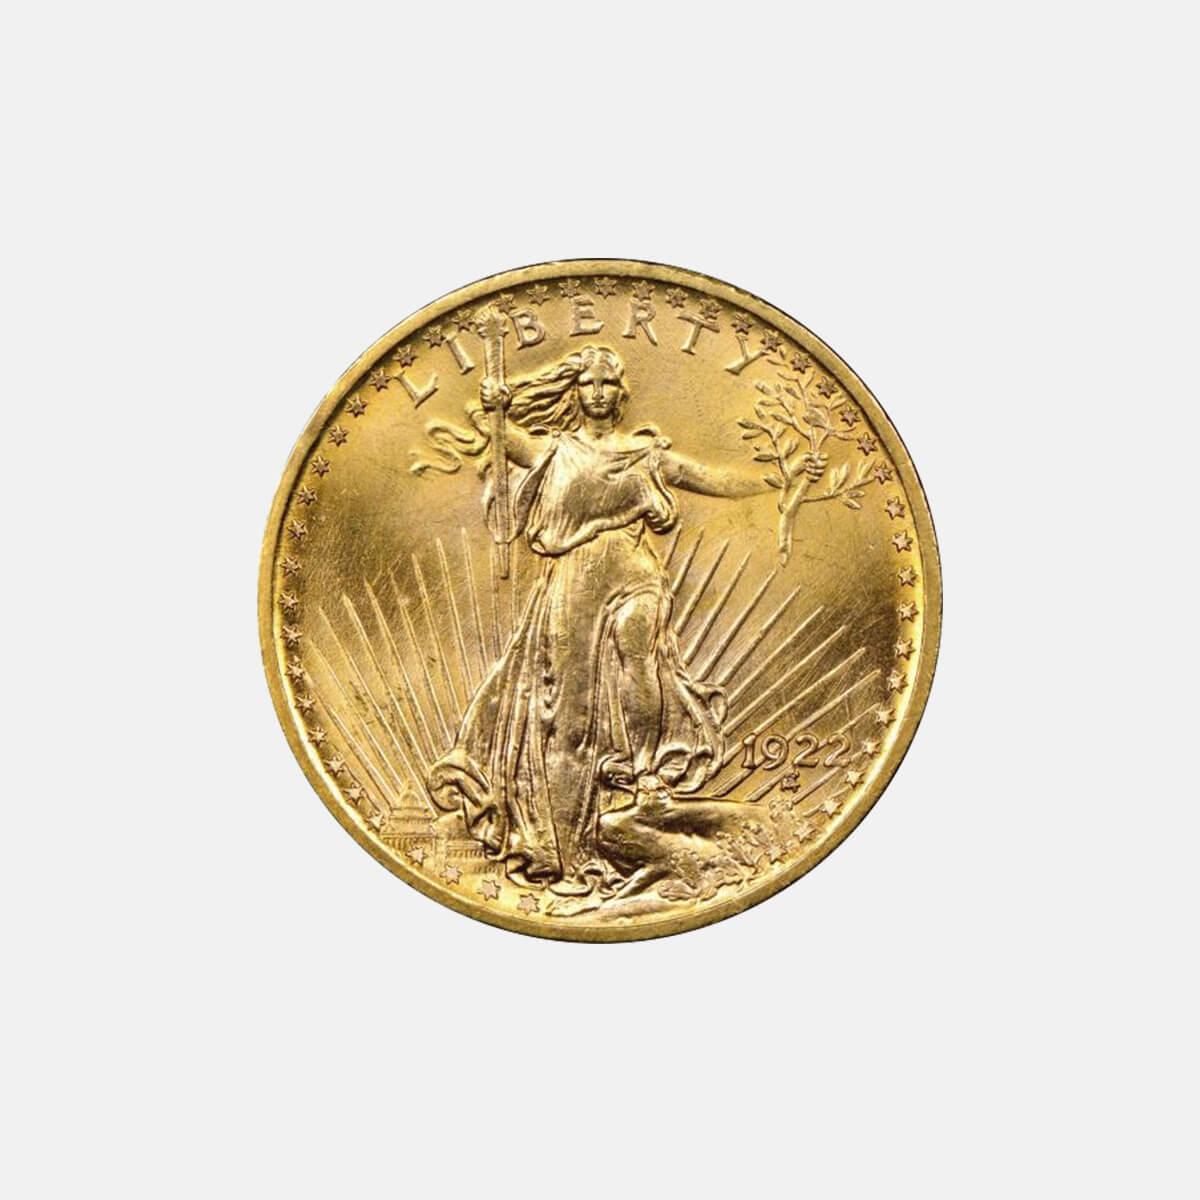 St Gaudens Double Eagle Coin Milwaukee Double Eagle Gold